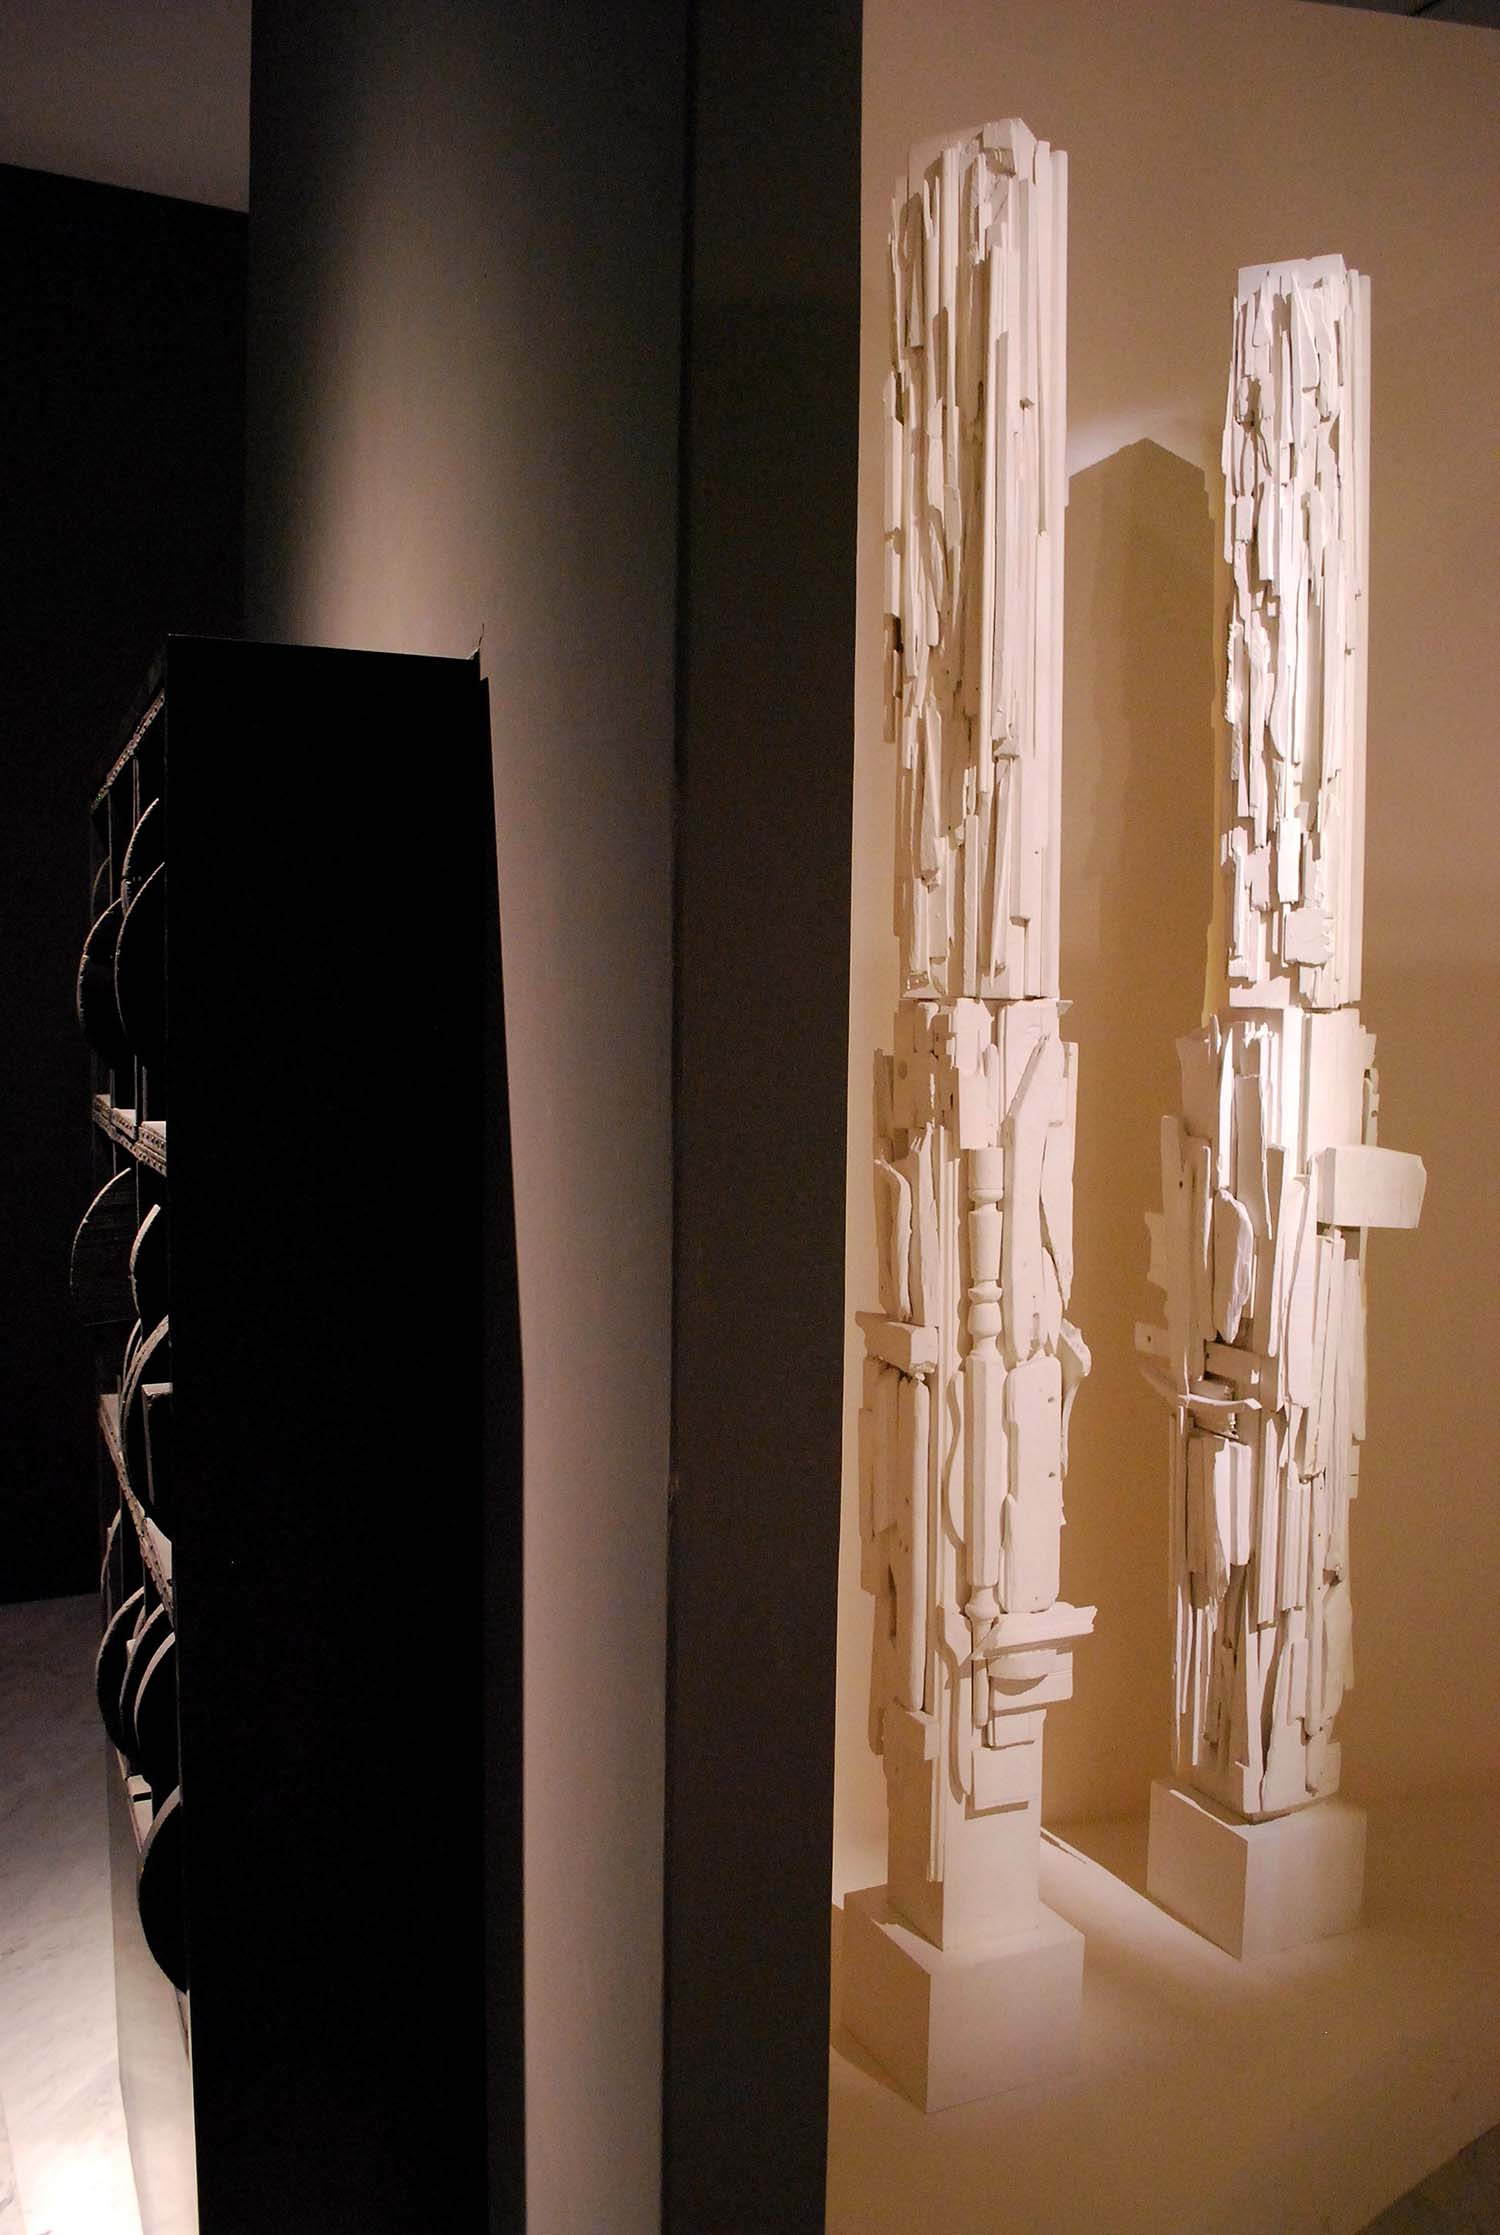 LOUISE-NEVELSON-PALAZZO-SCIARRA-ROMA-2013 (1)